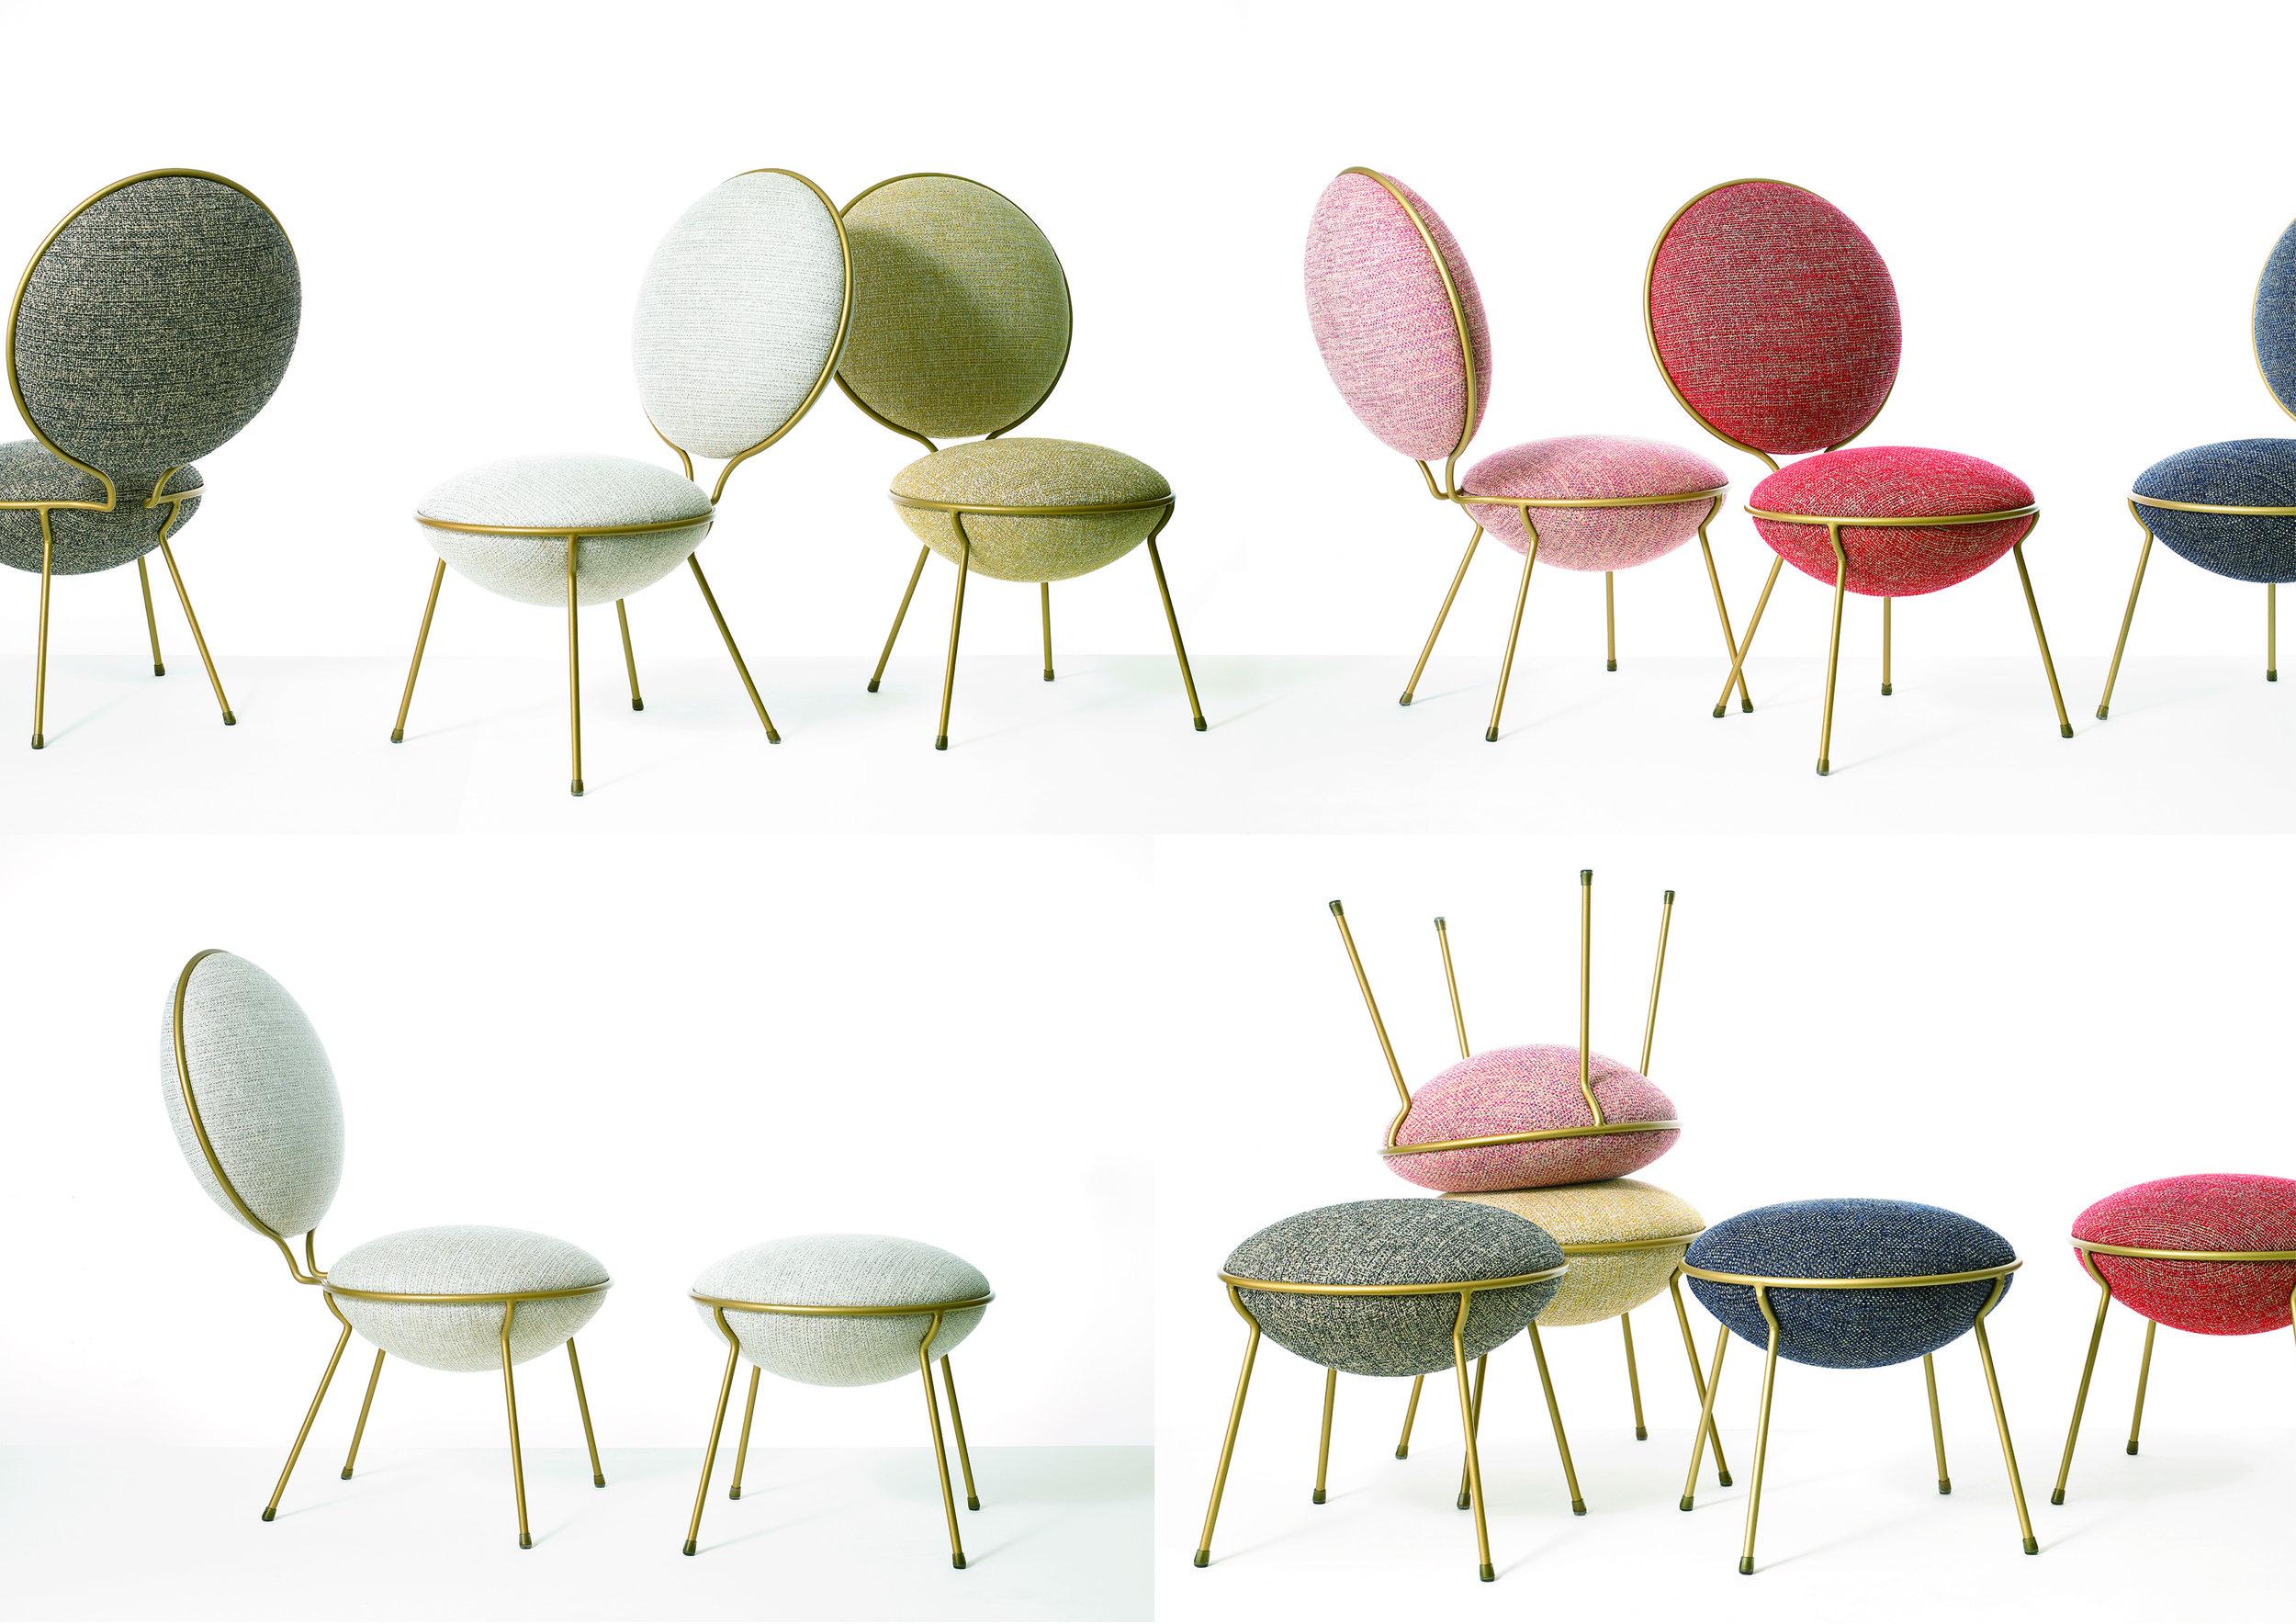 Project: Macaron Chair - Design by: Yoshiya Fukuda Architecture & DesignInterior Division: Furniture DesignWebsite: http://www.yoshiyafukuda.com